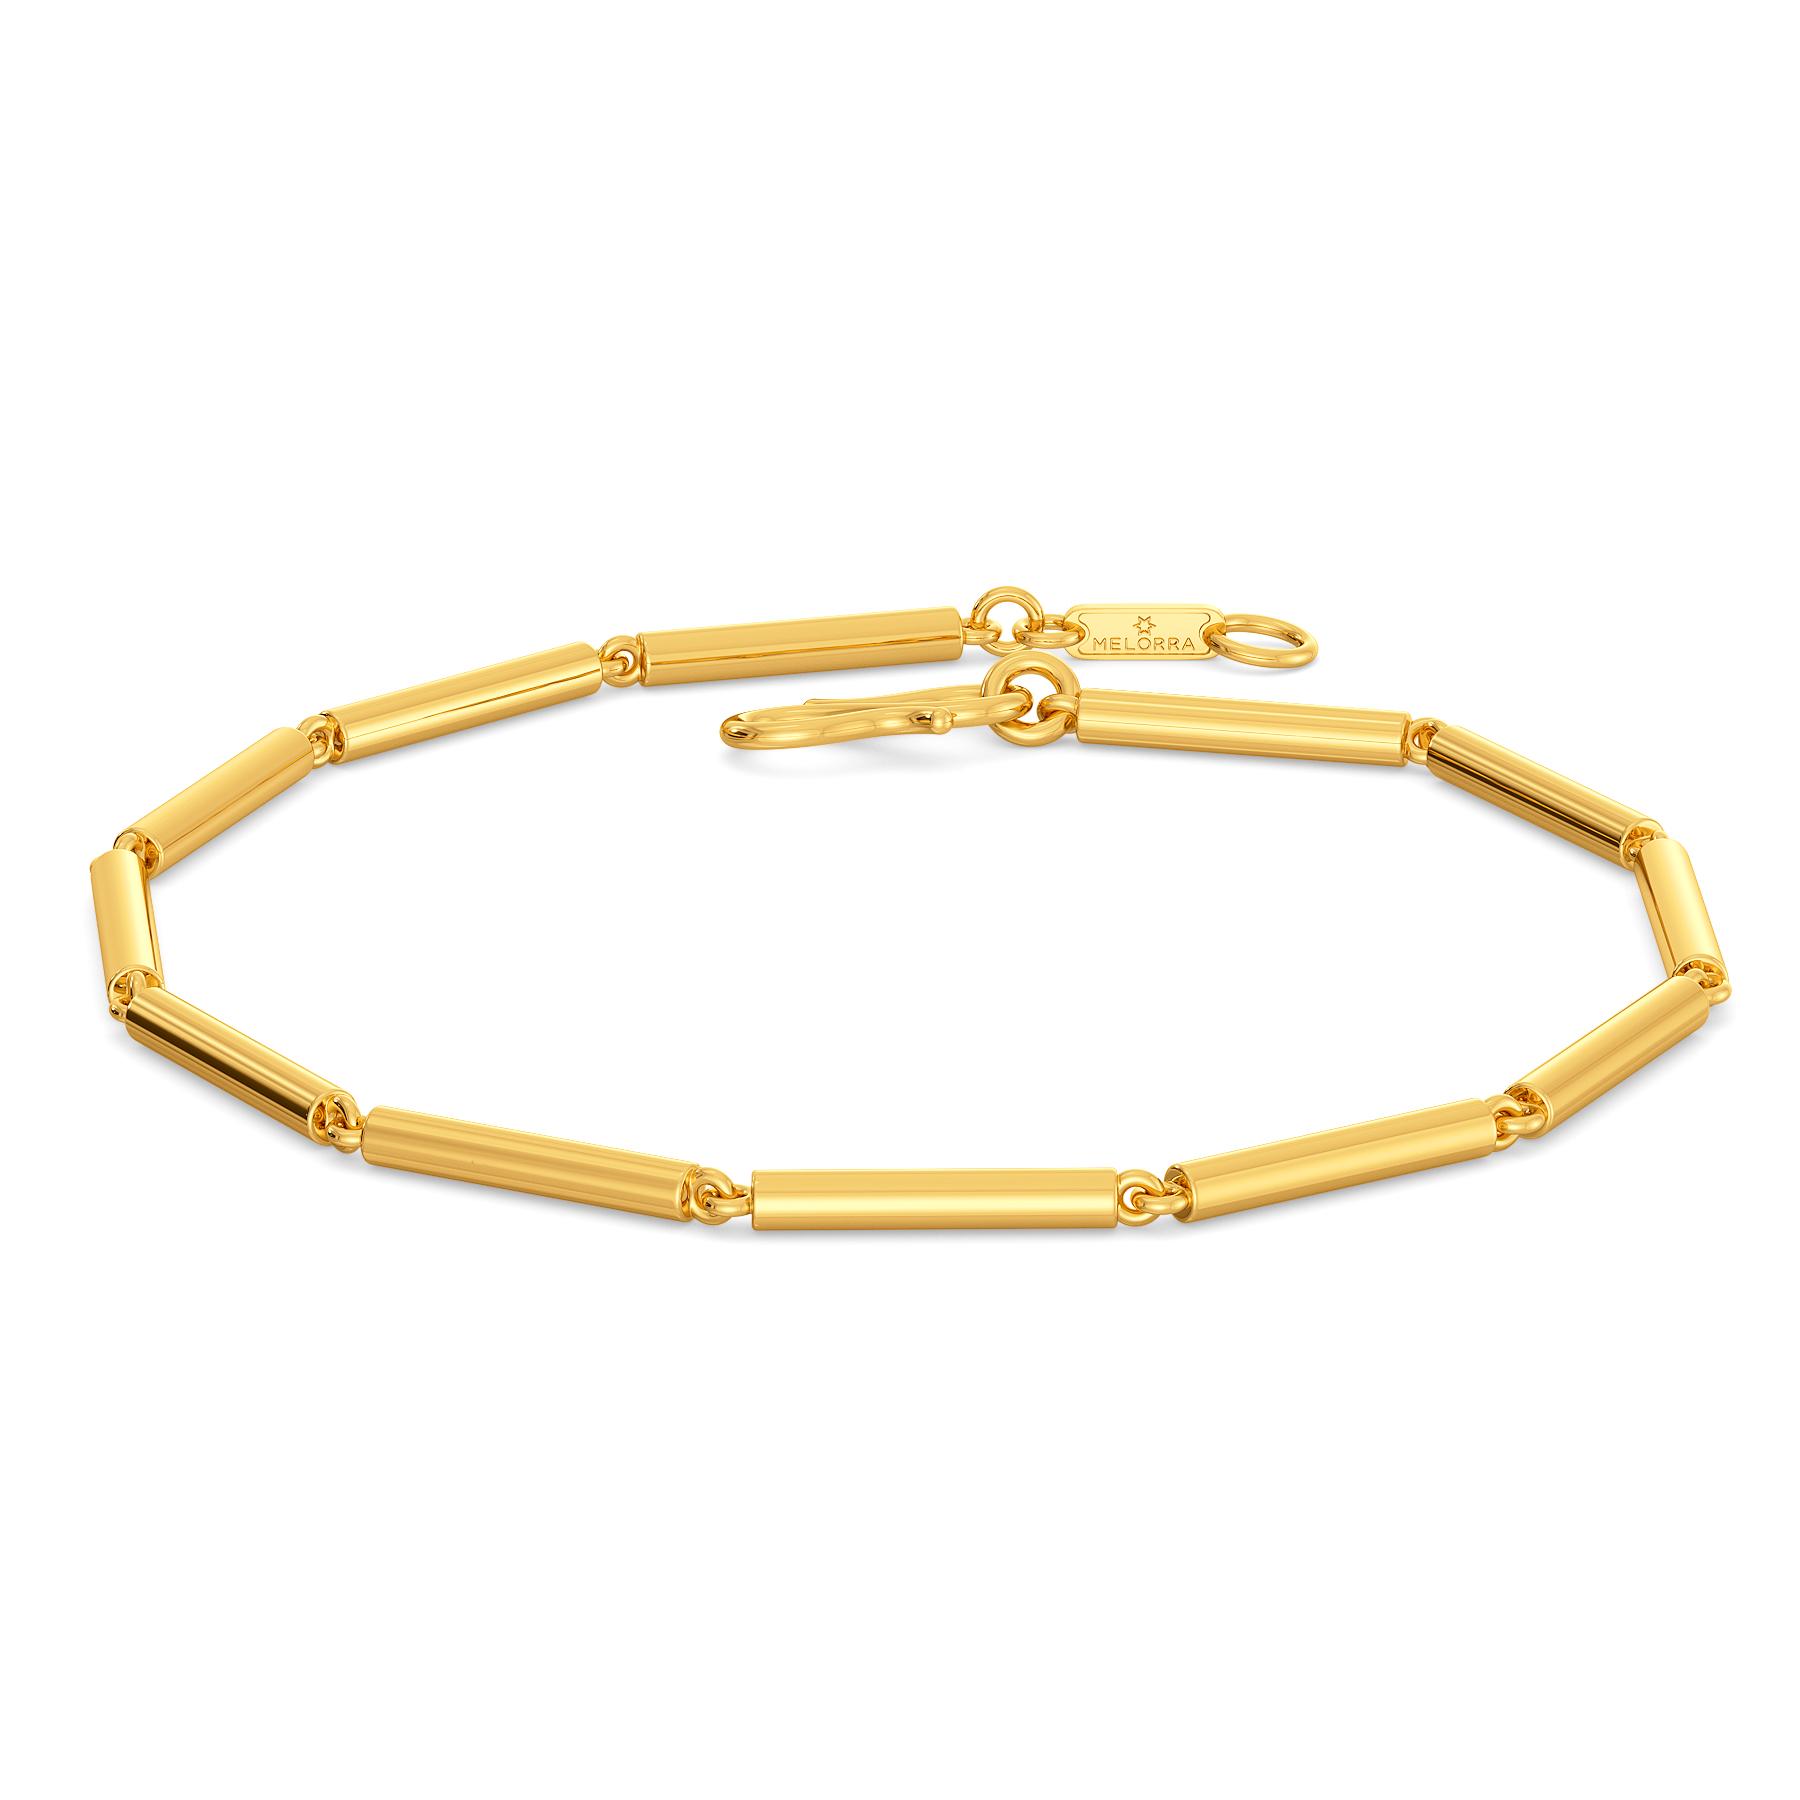 Tube Play Gold Bracelets